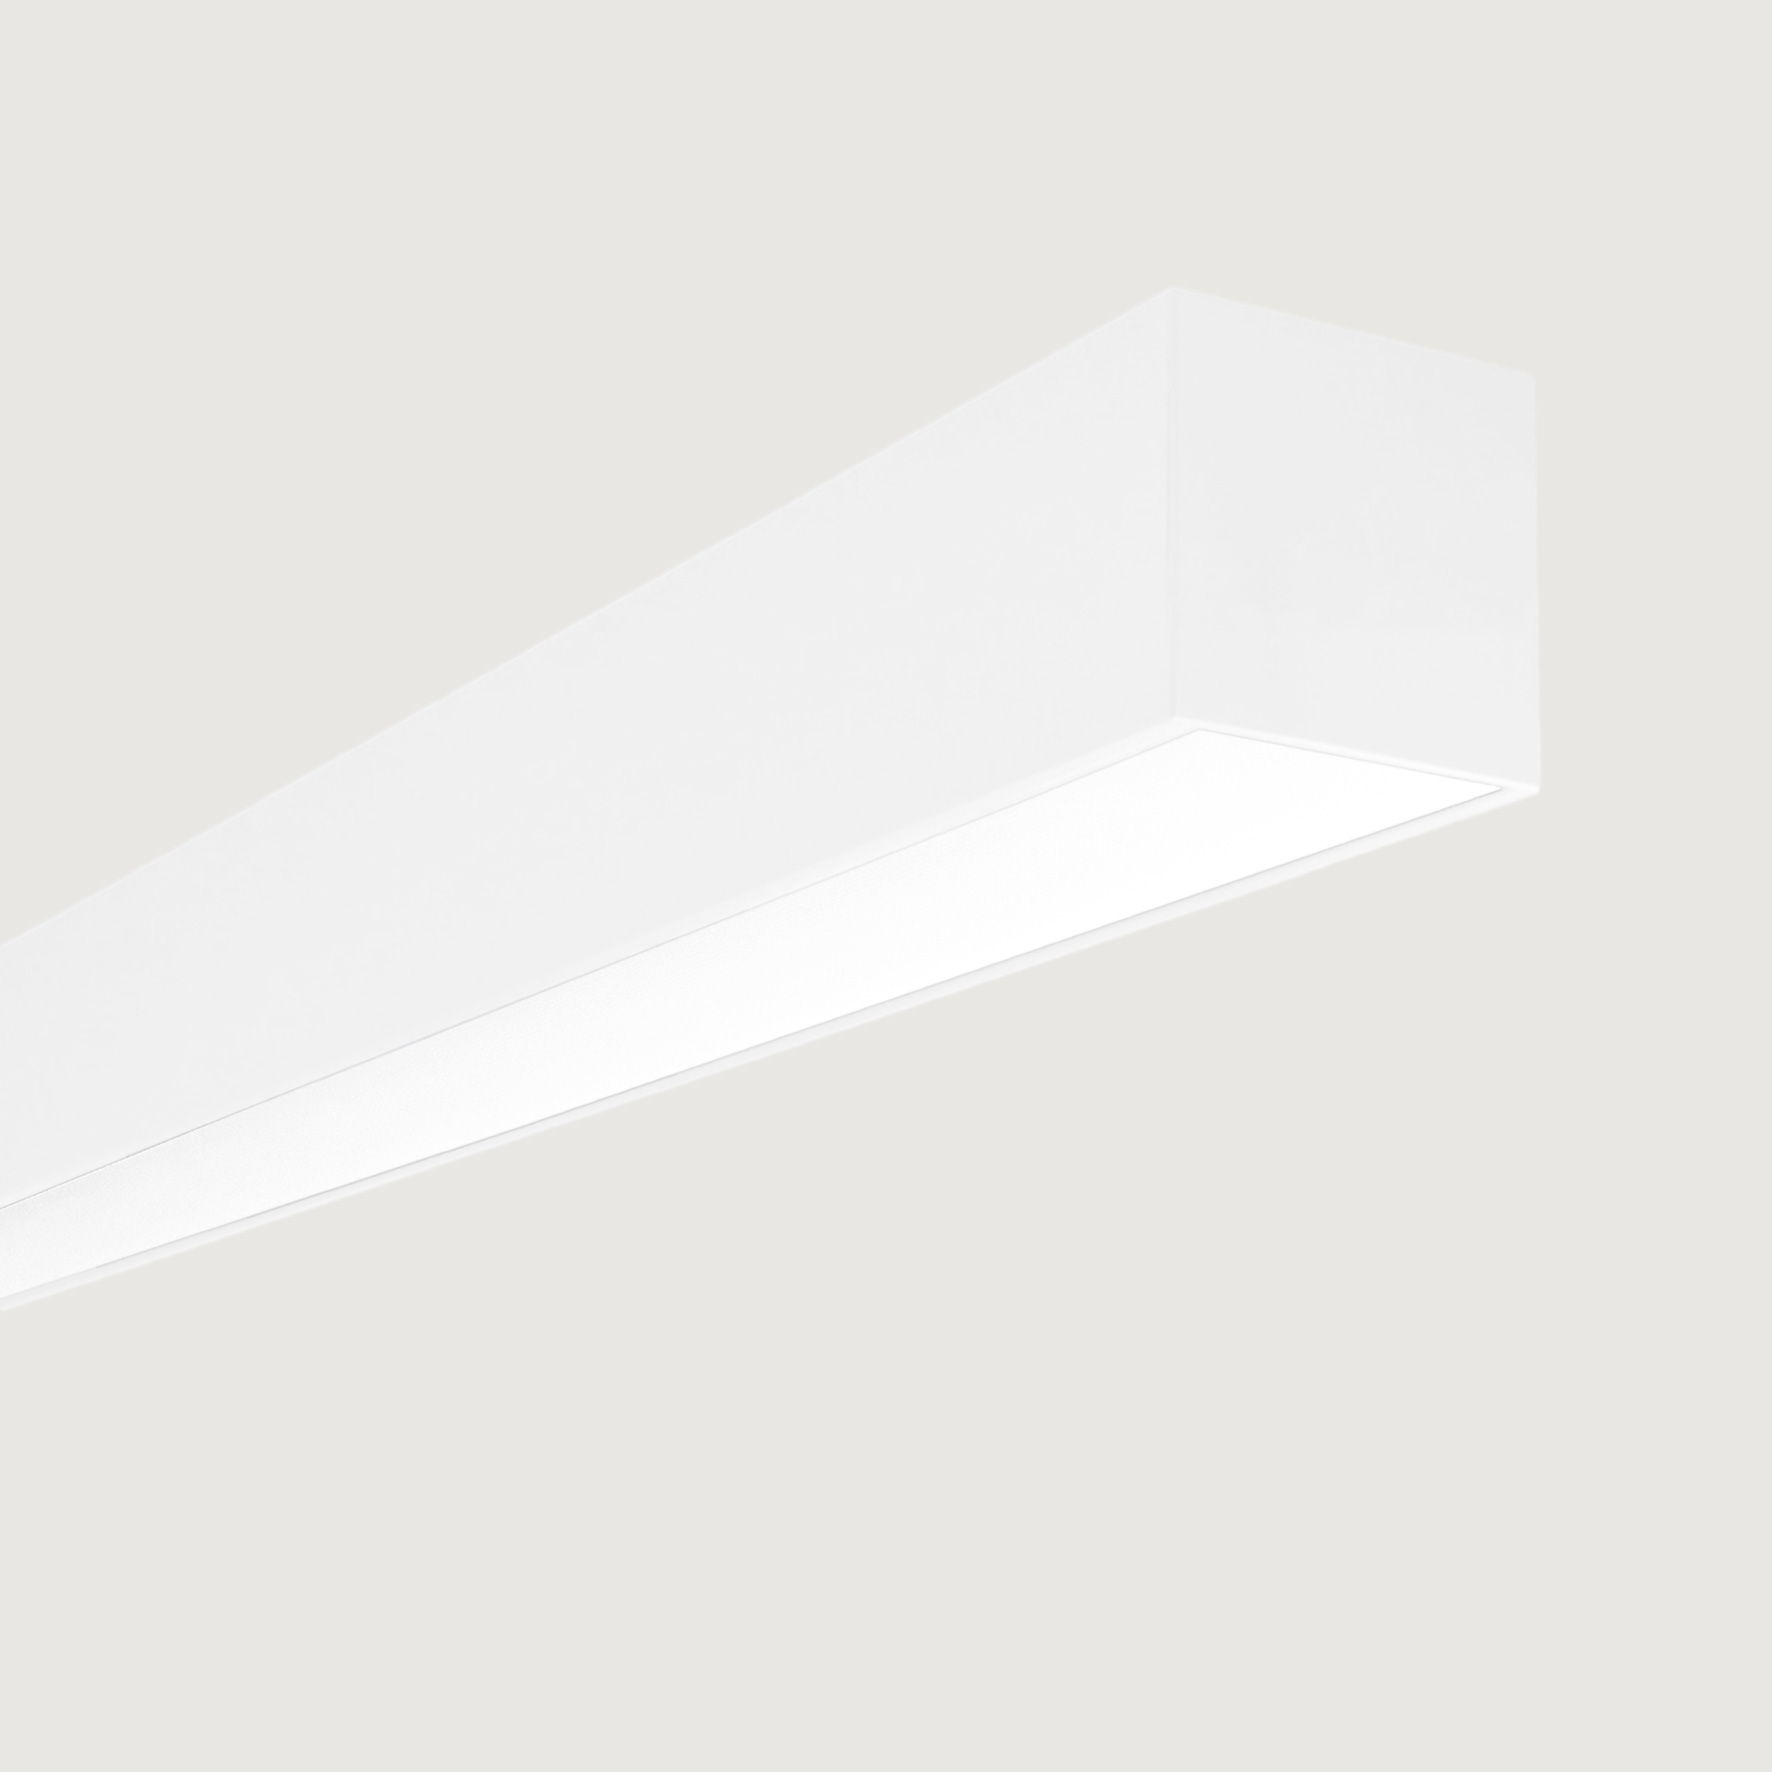 SL85-profilleuchte-weiß-sml-led